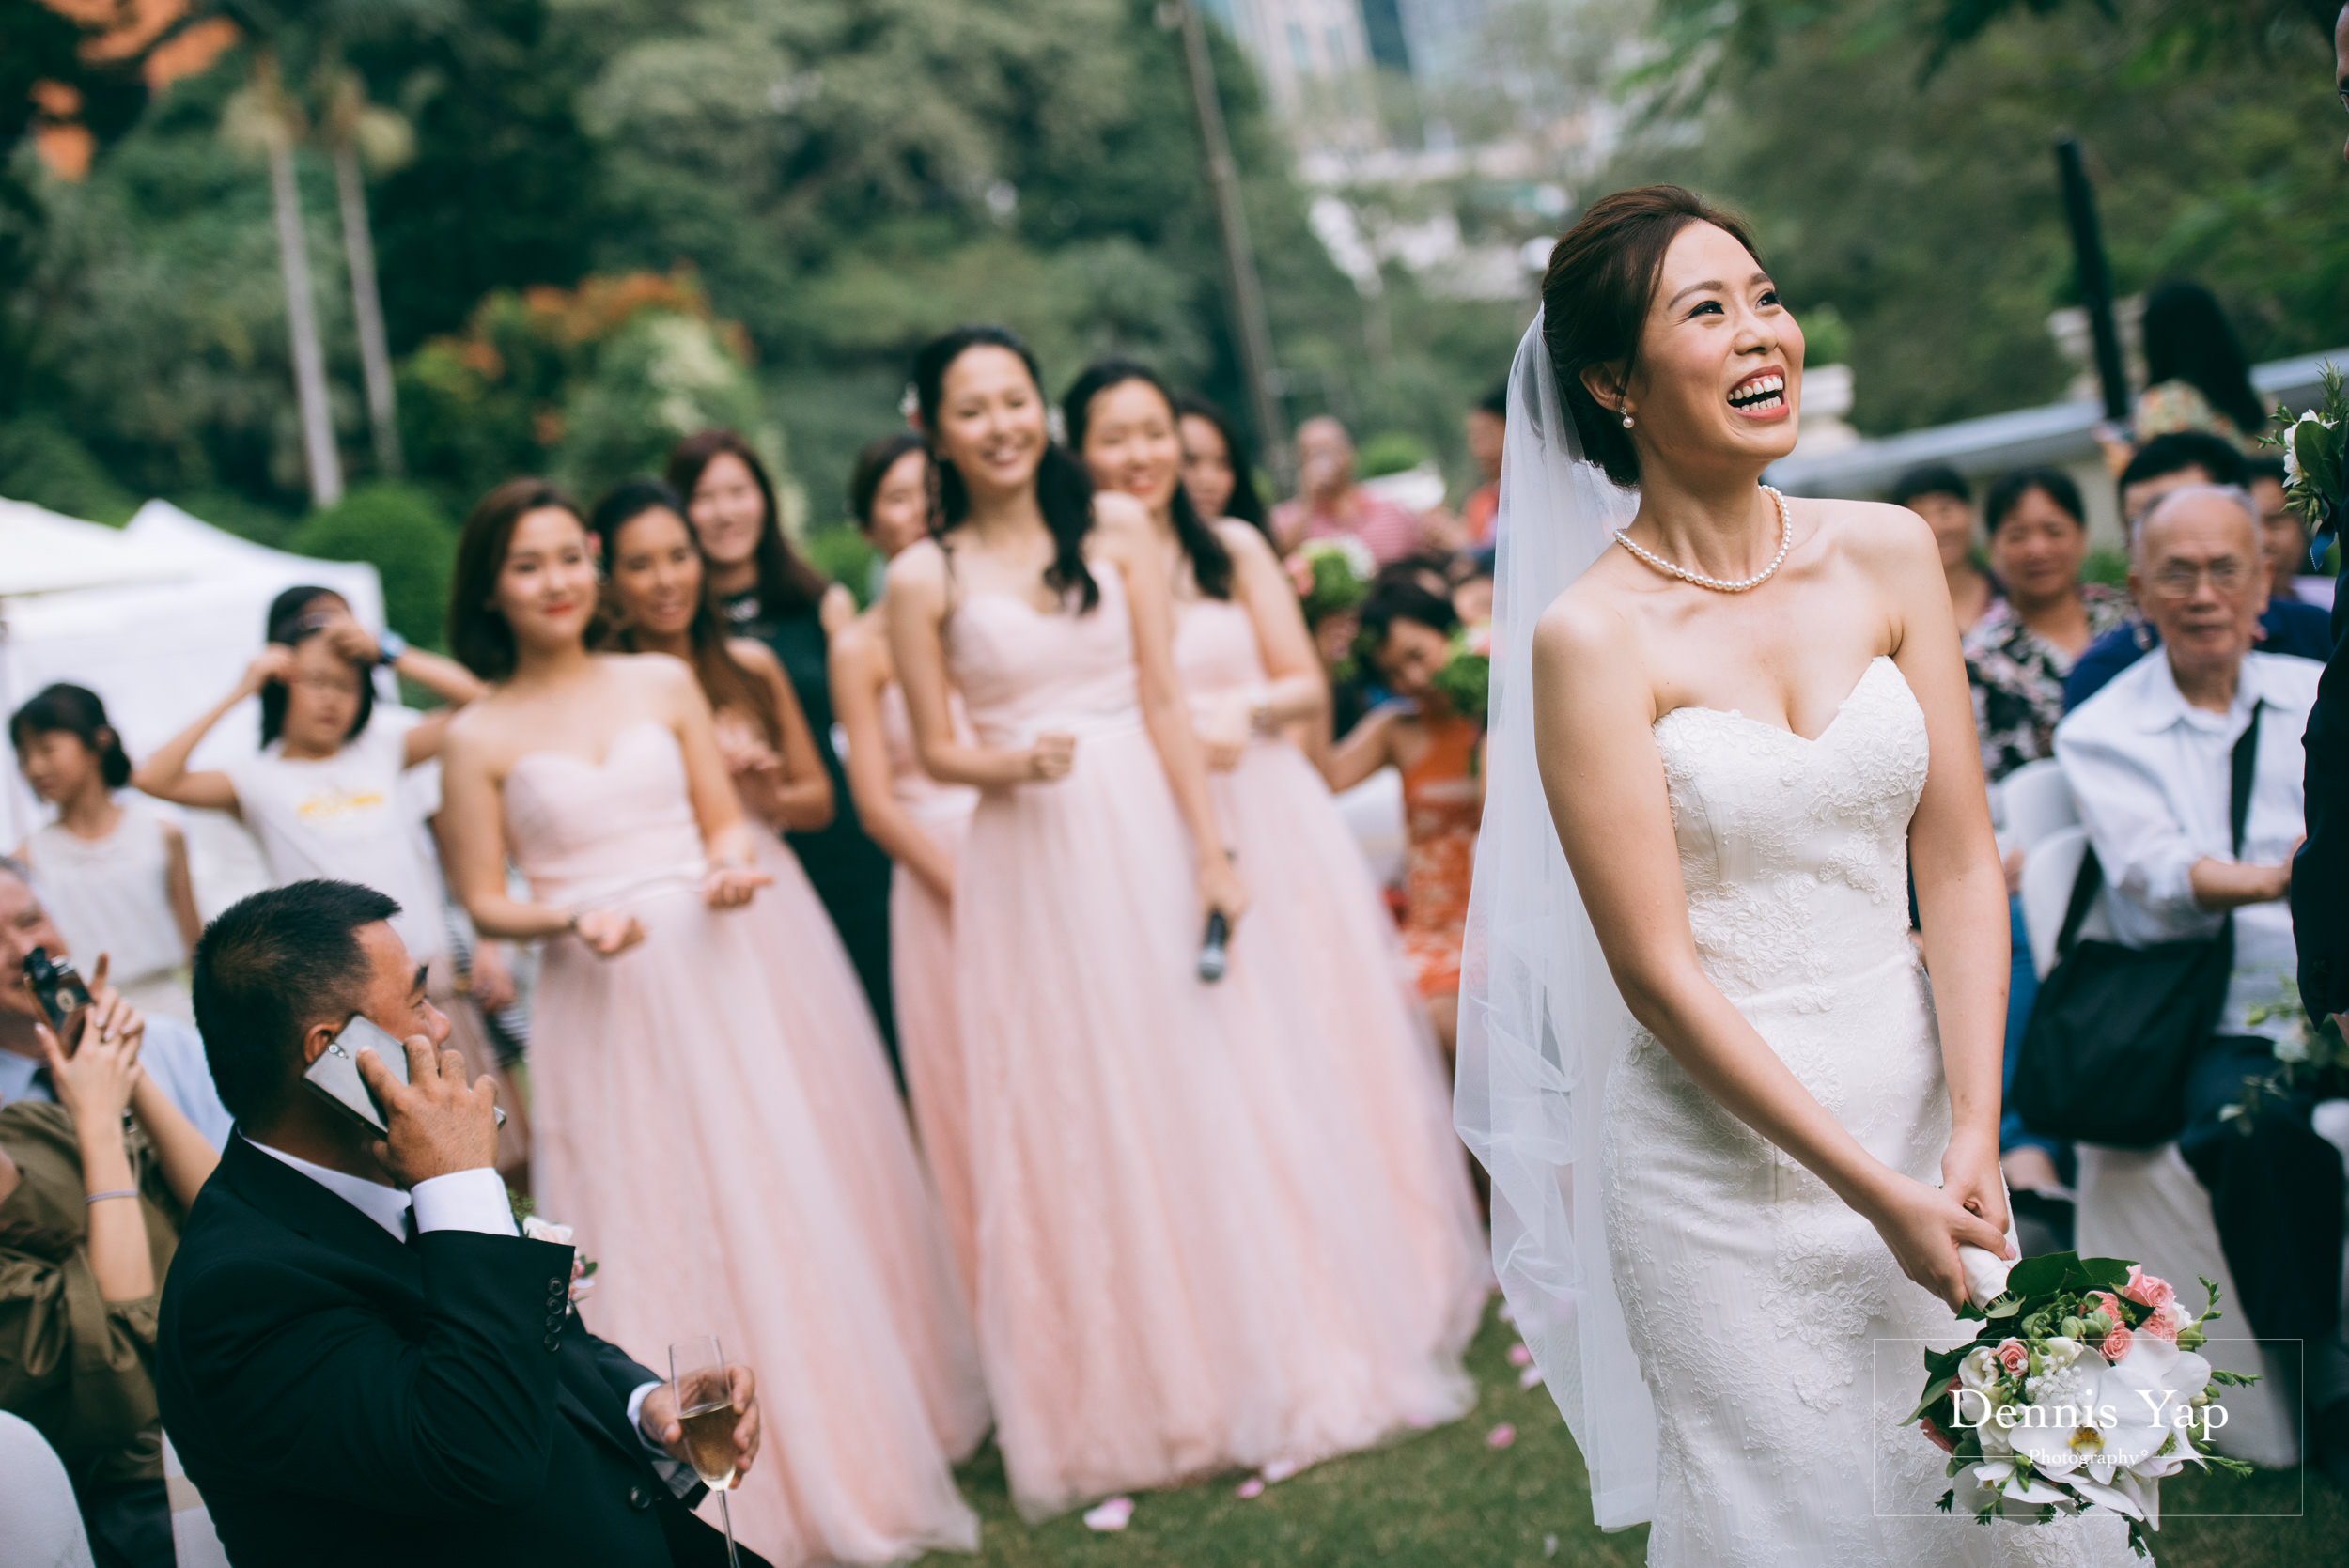 jason crystal wedding day gate crash hong kong garden wedding dennis yap photography-33.jpg